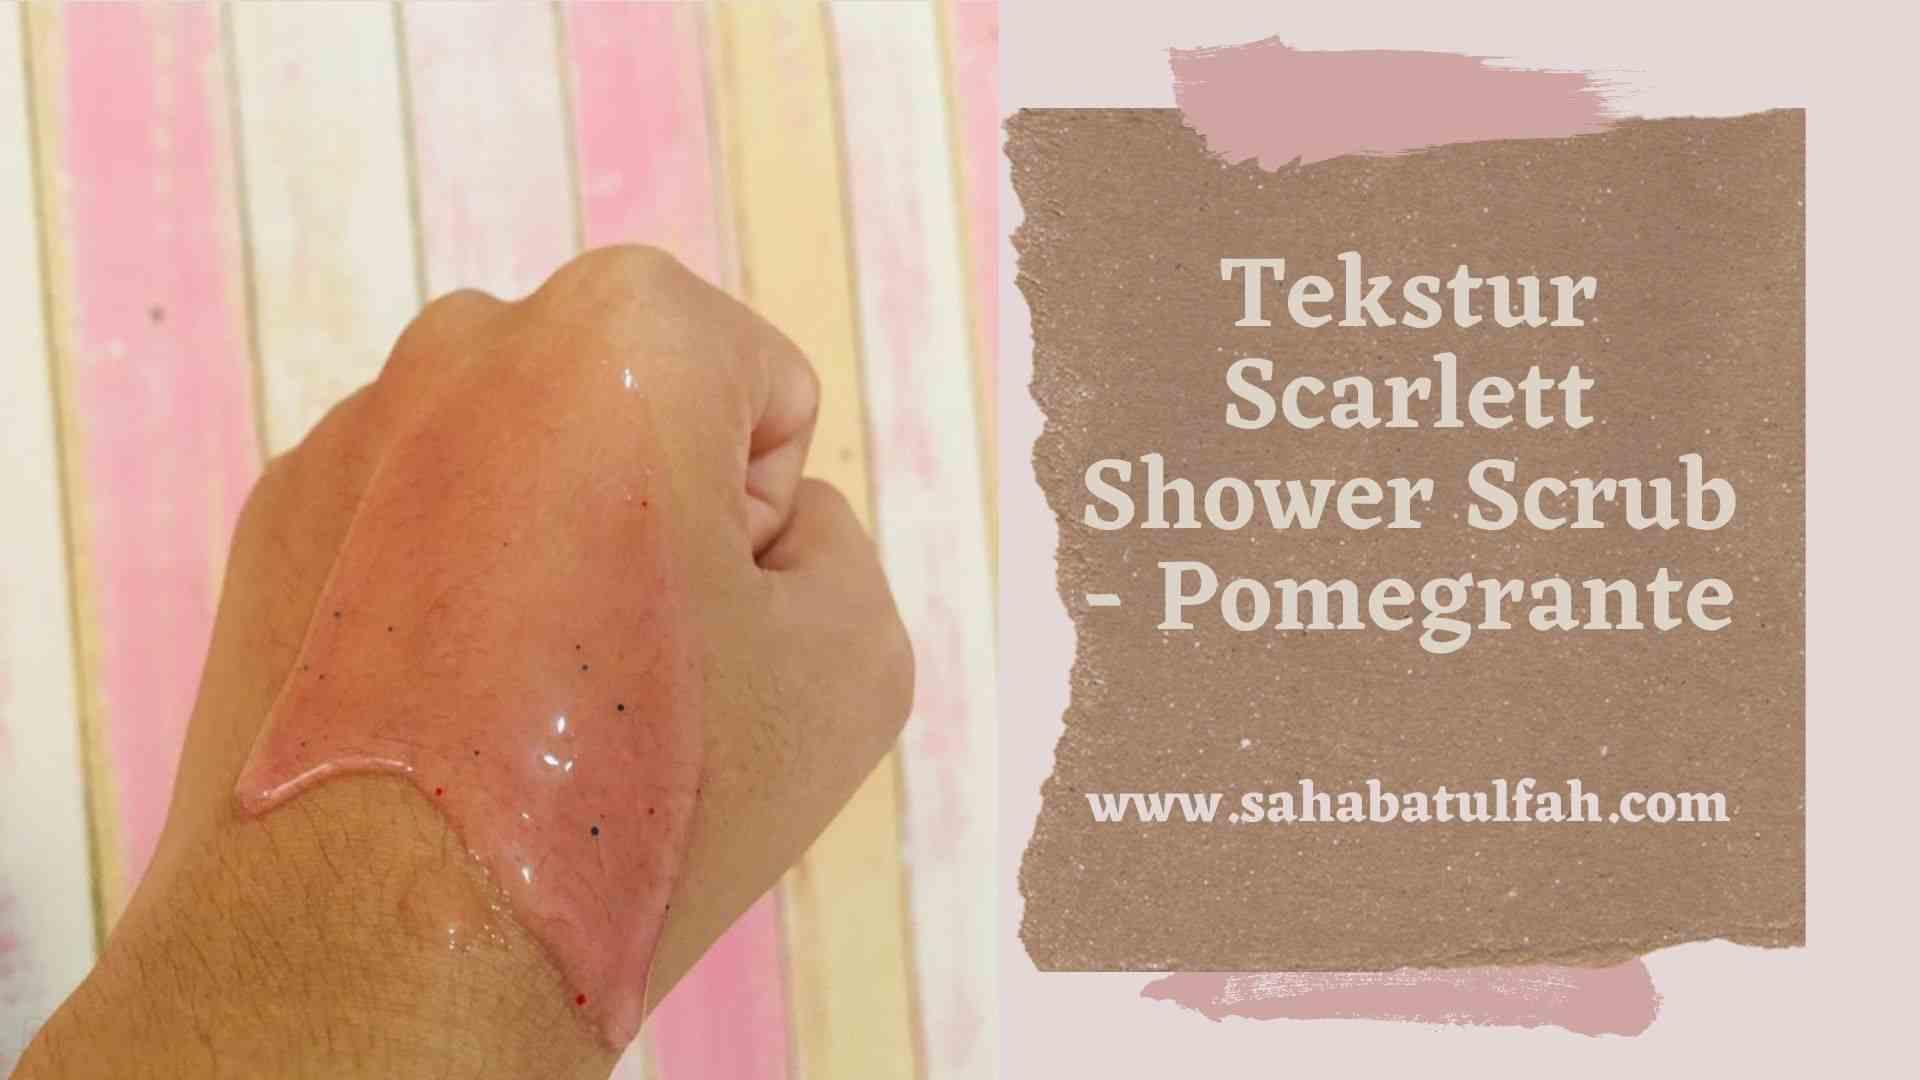 Wangi-dan -Tekstur-Scarlett-Shower-Scrub - Pomegrante